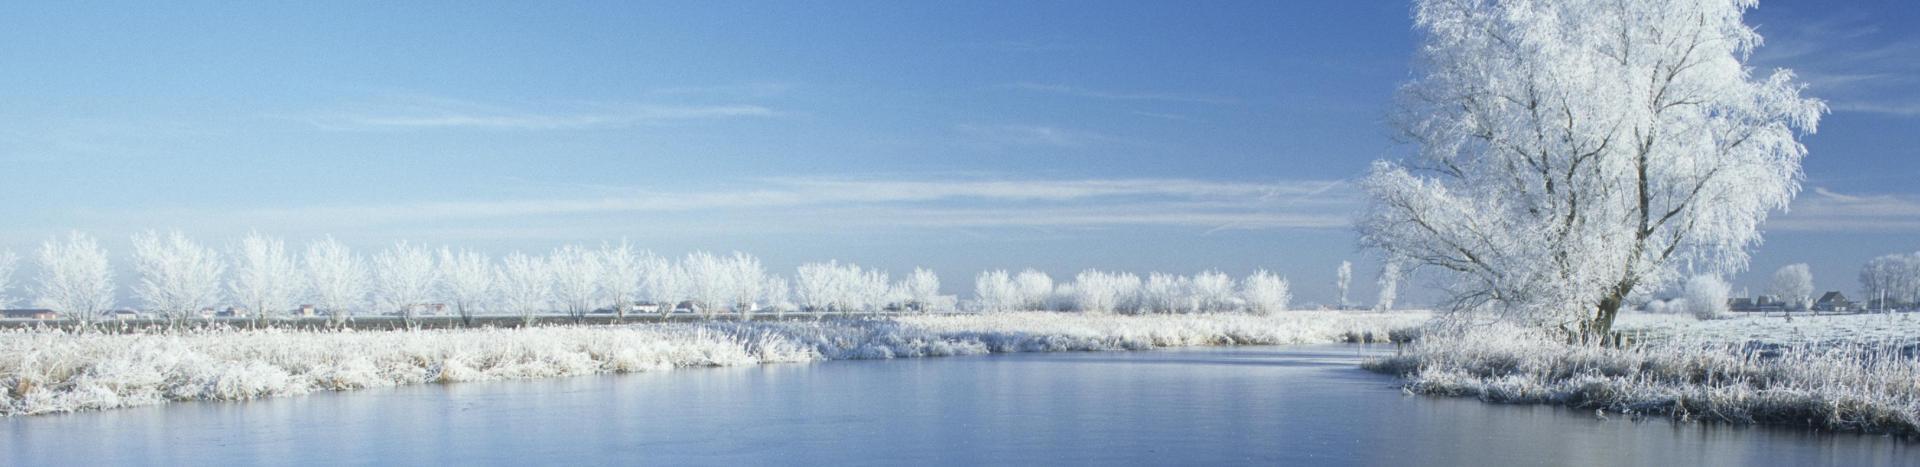 Winter in Assenede